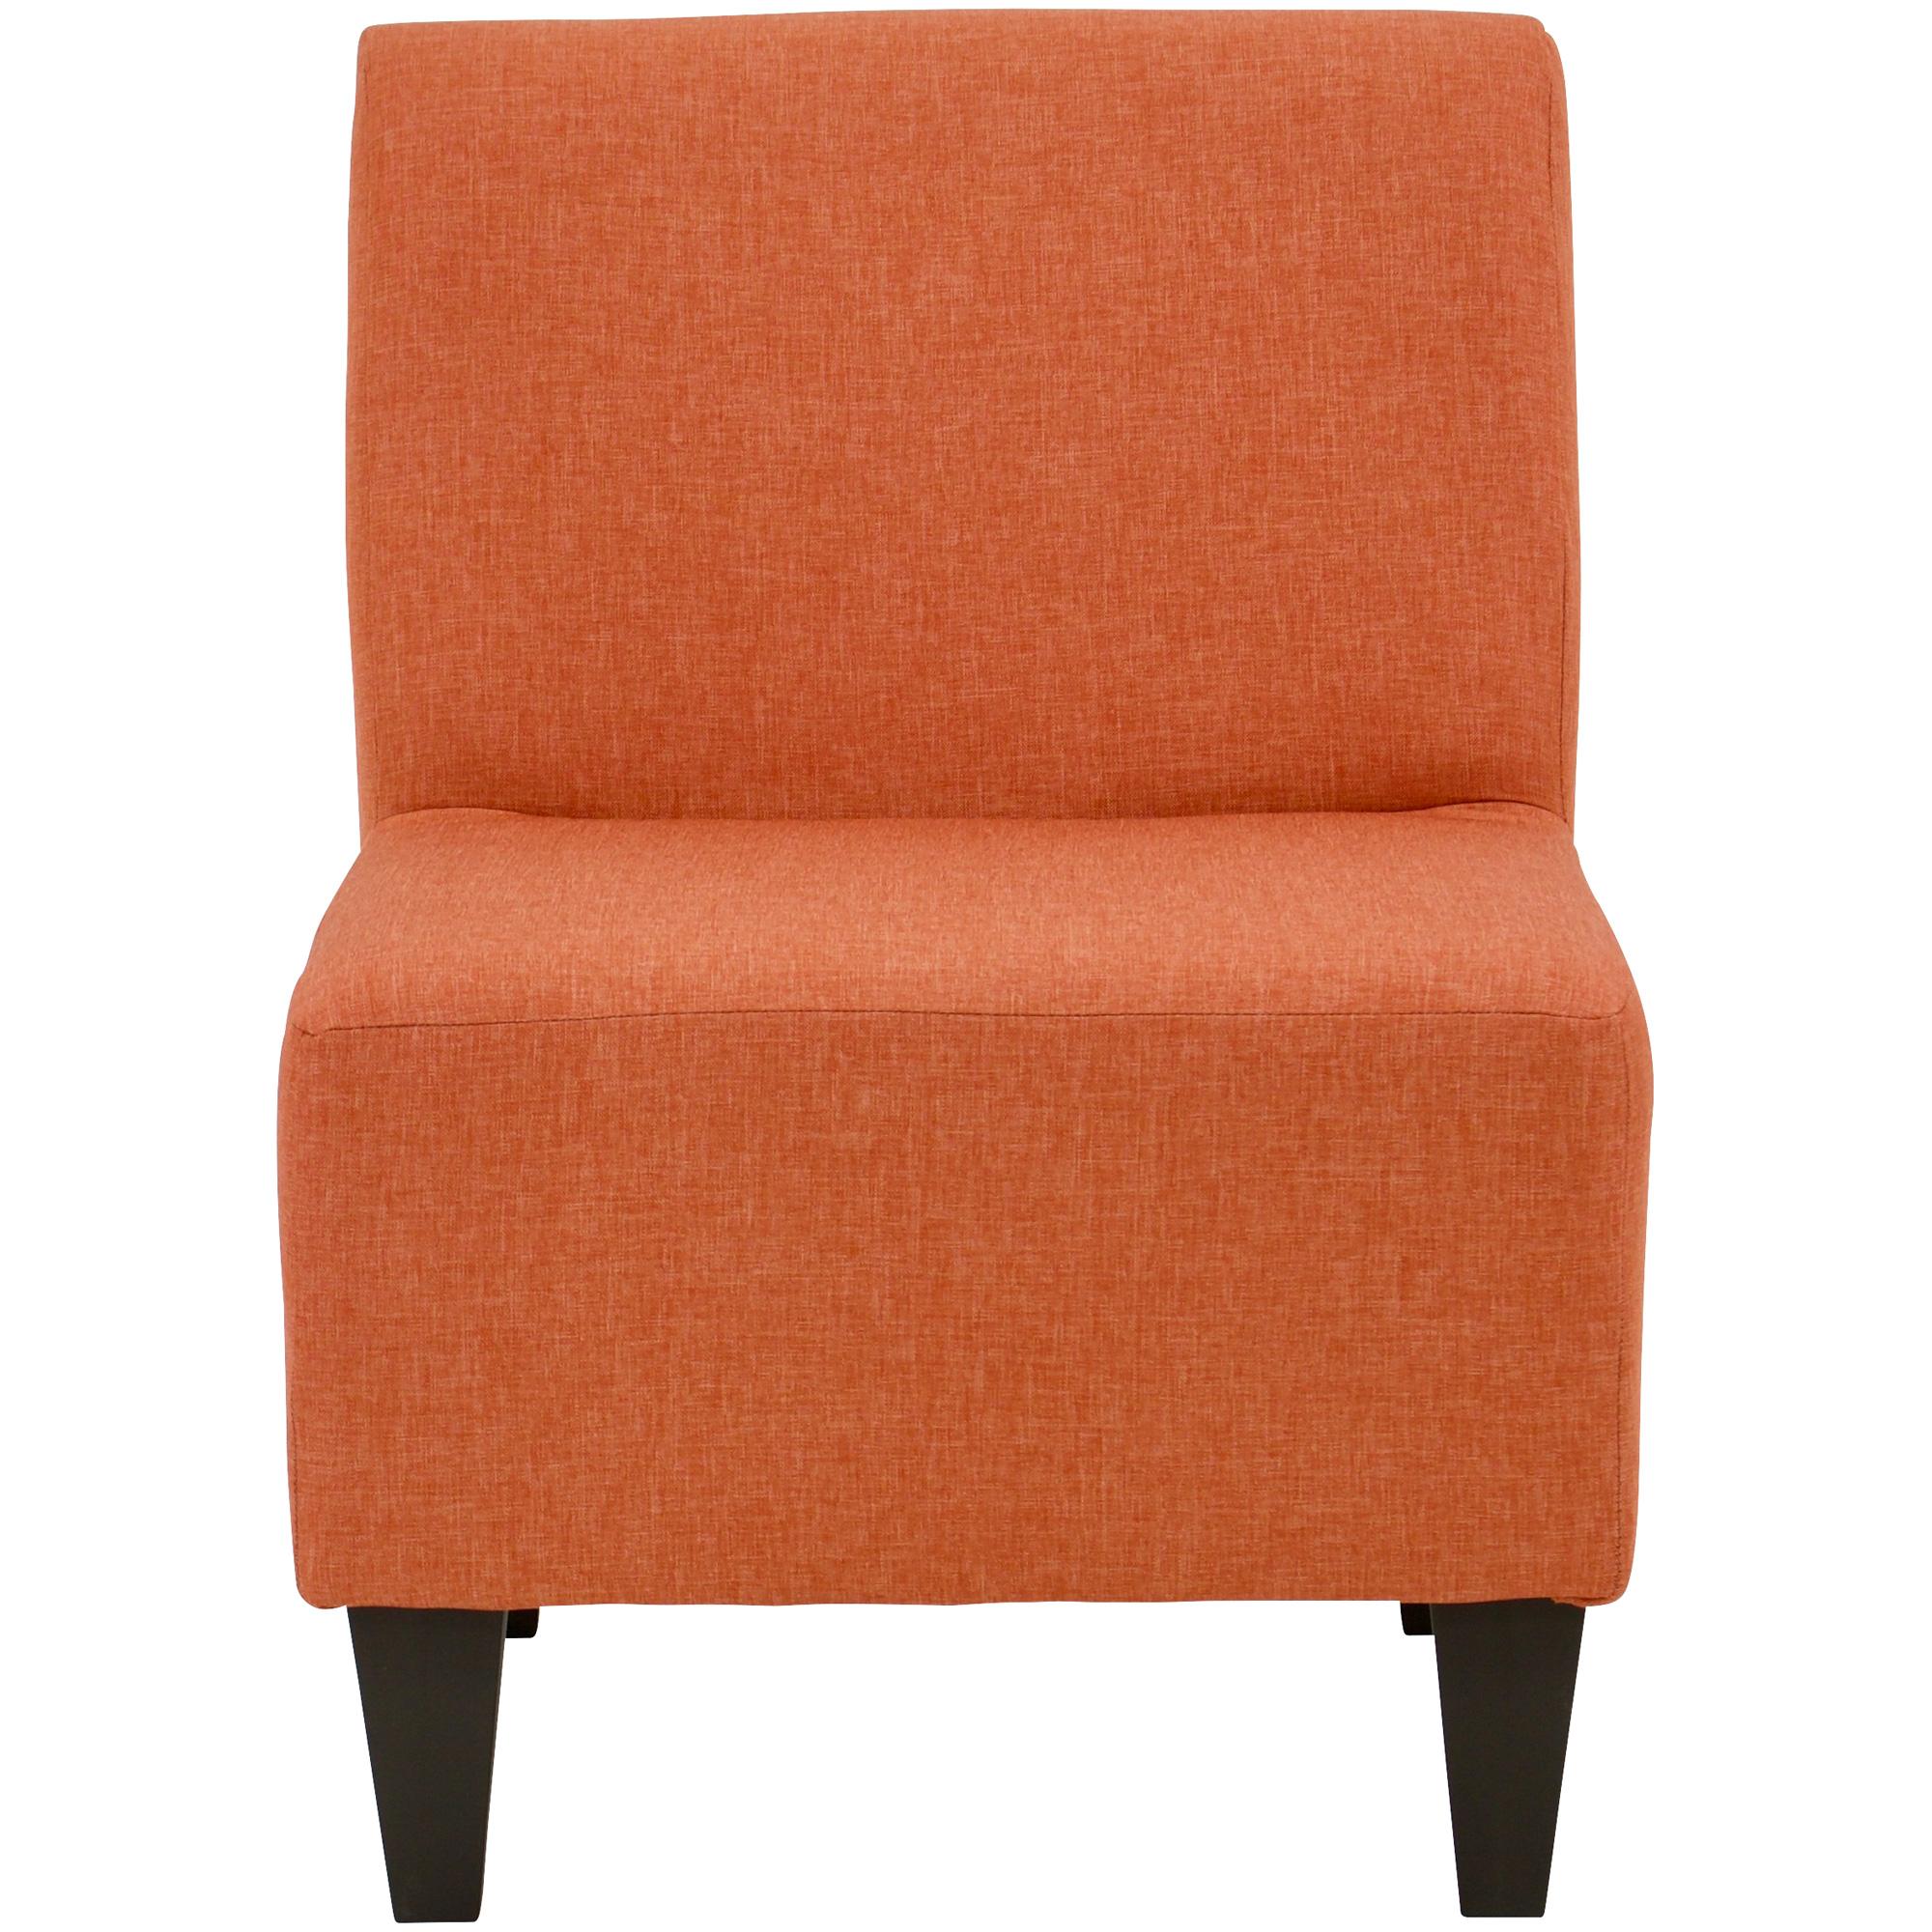 Overman | Amanda Mango Accent Chair